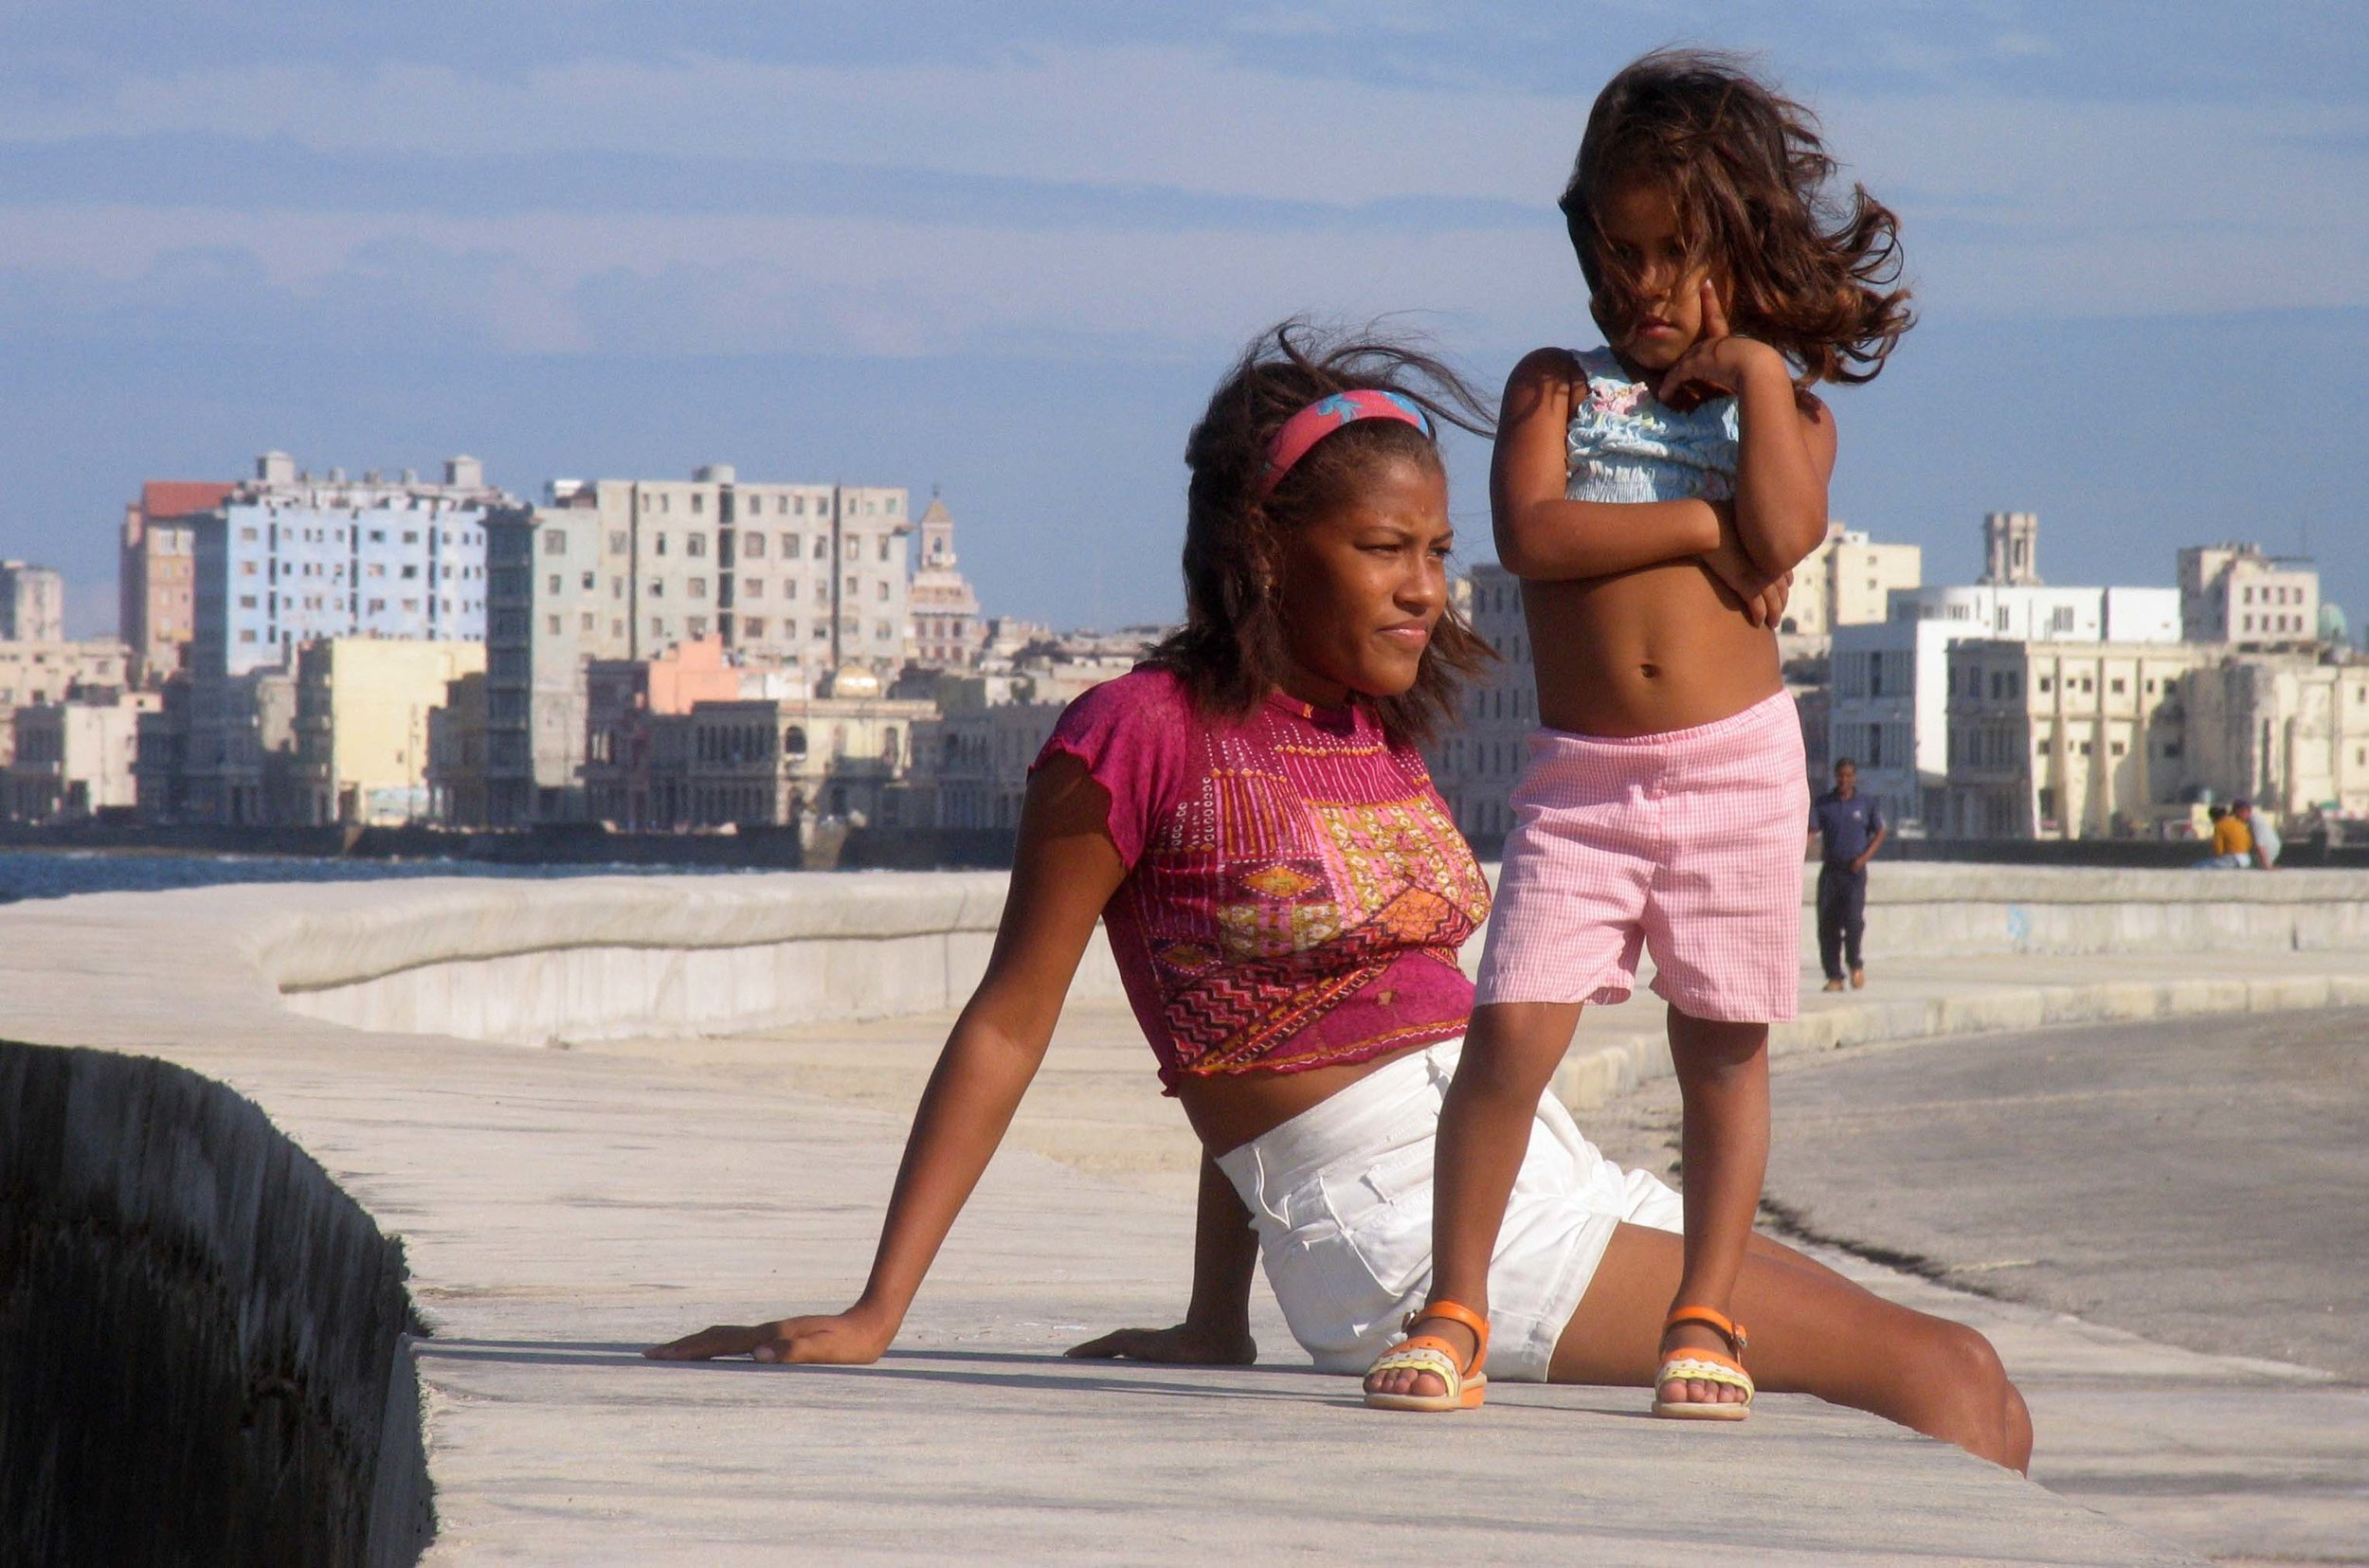 The Malecon, Havana